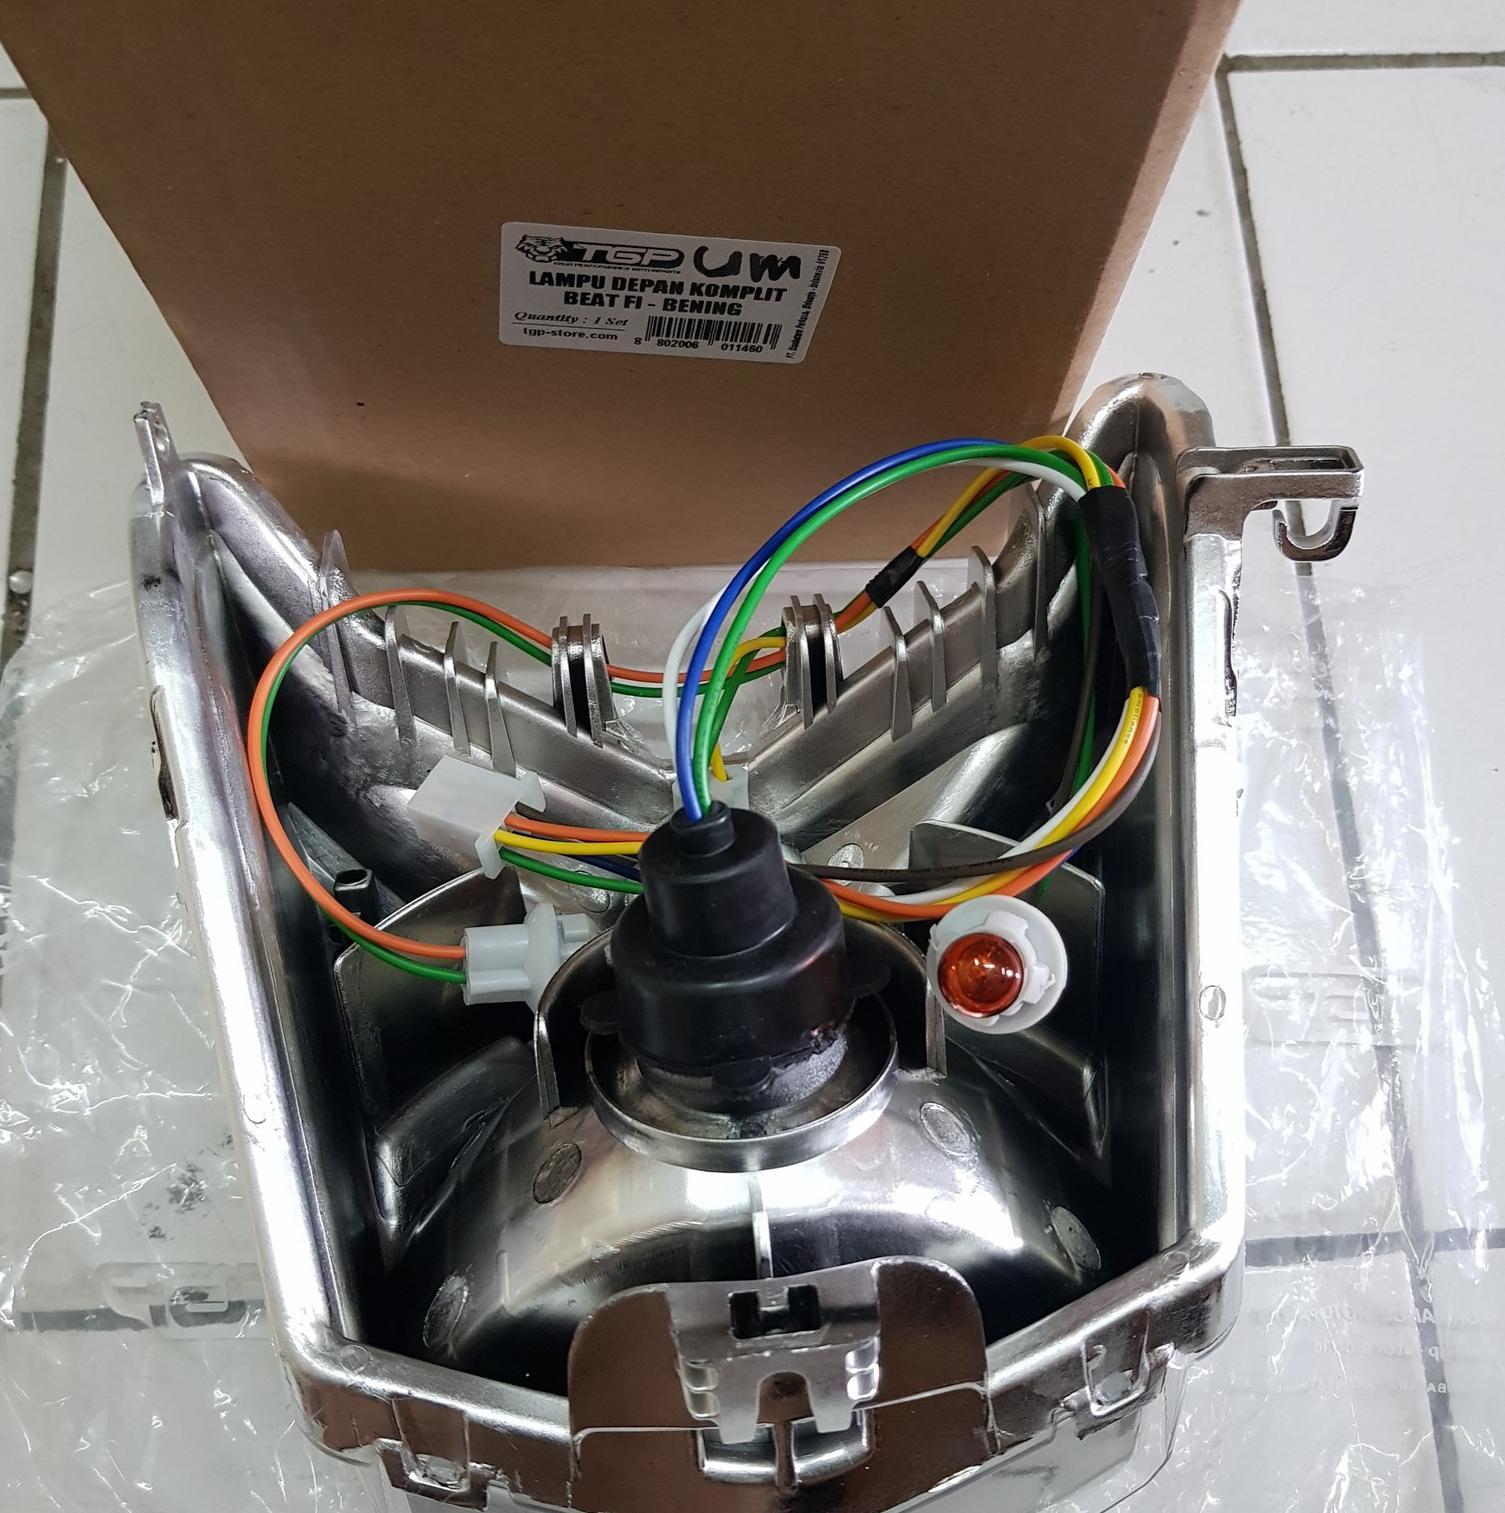 Reflektor Lampu Depan Beat Fi 2013 - 2015 Komplit Assy TGP High Qual